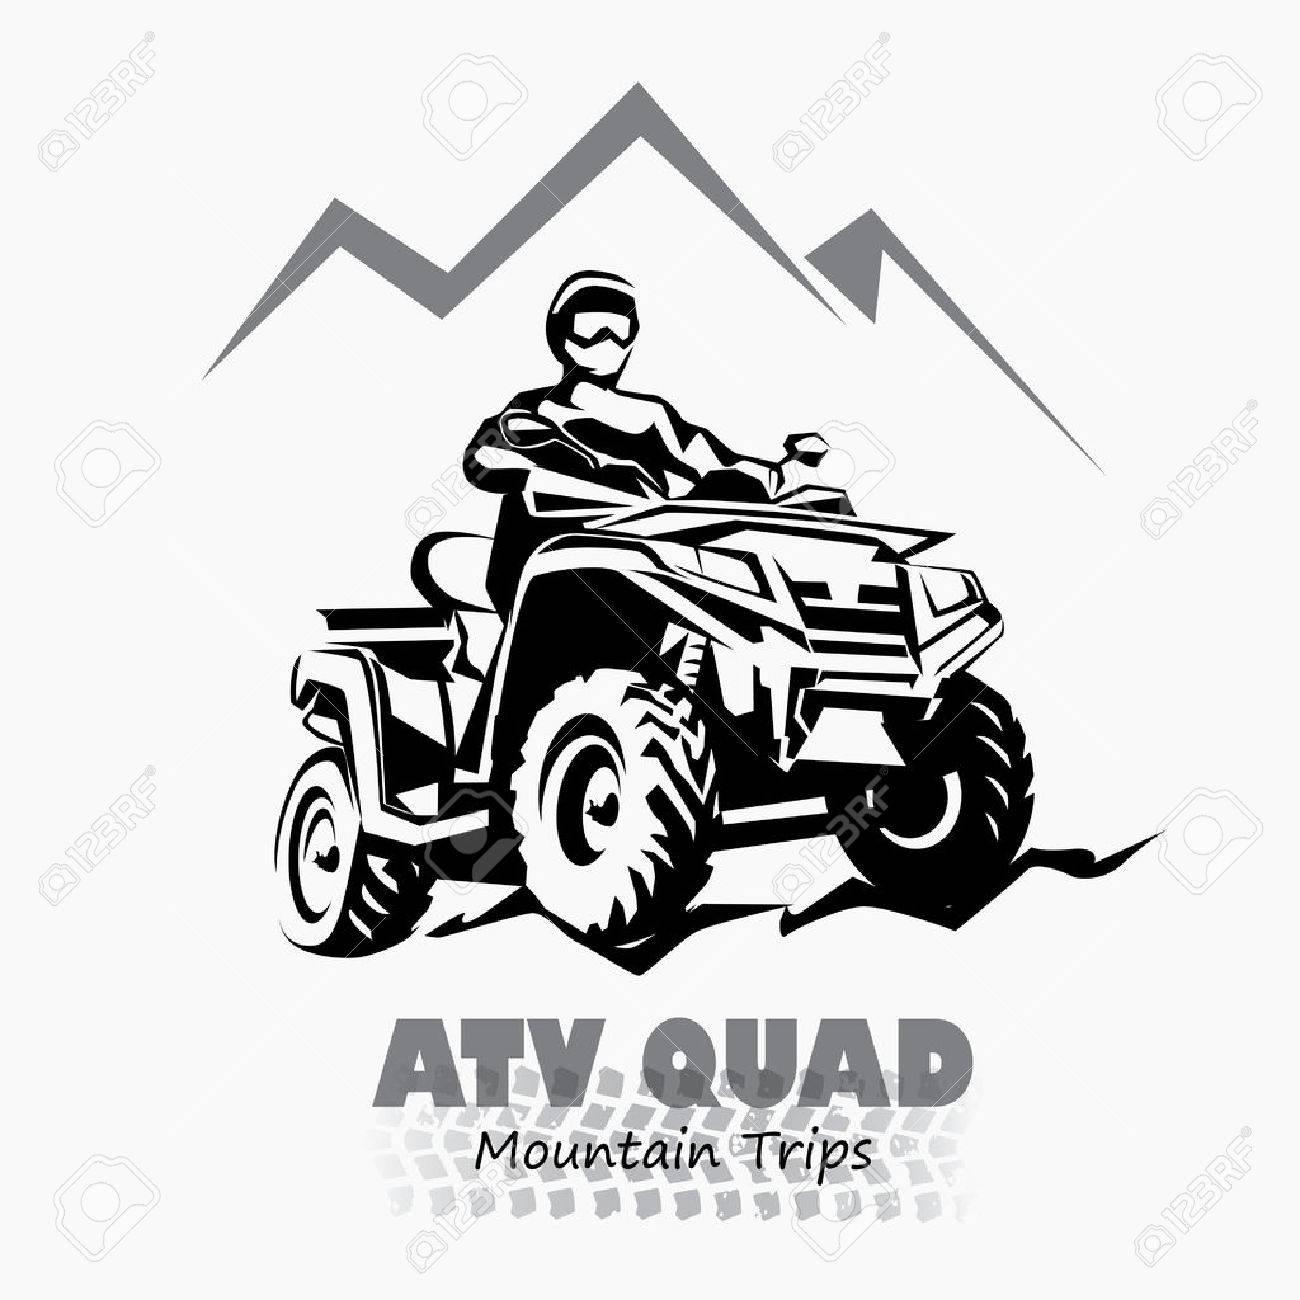 atv, quad bike stylized silhouette vector symbol, design element for emblem - 64538963